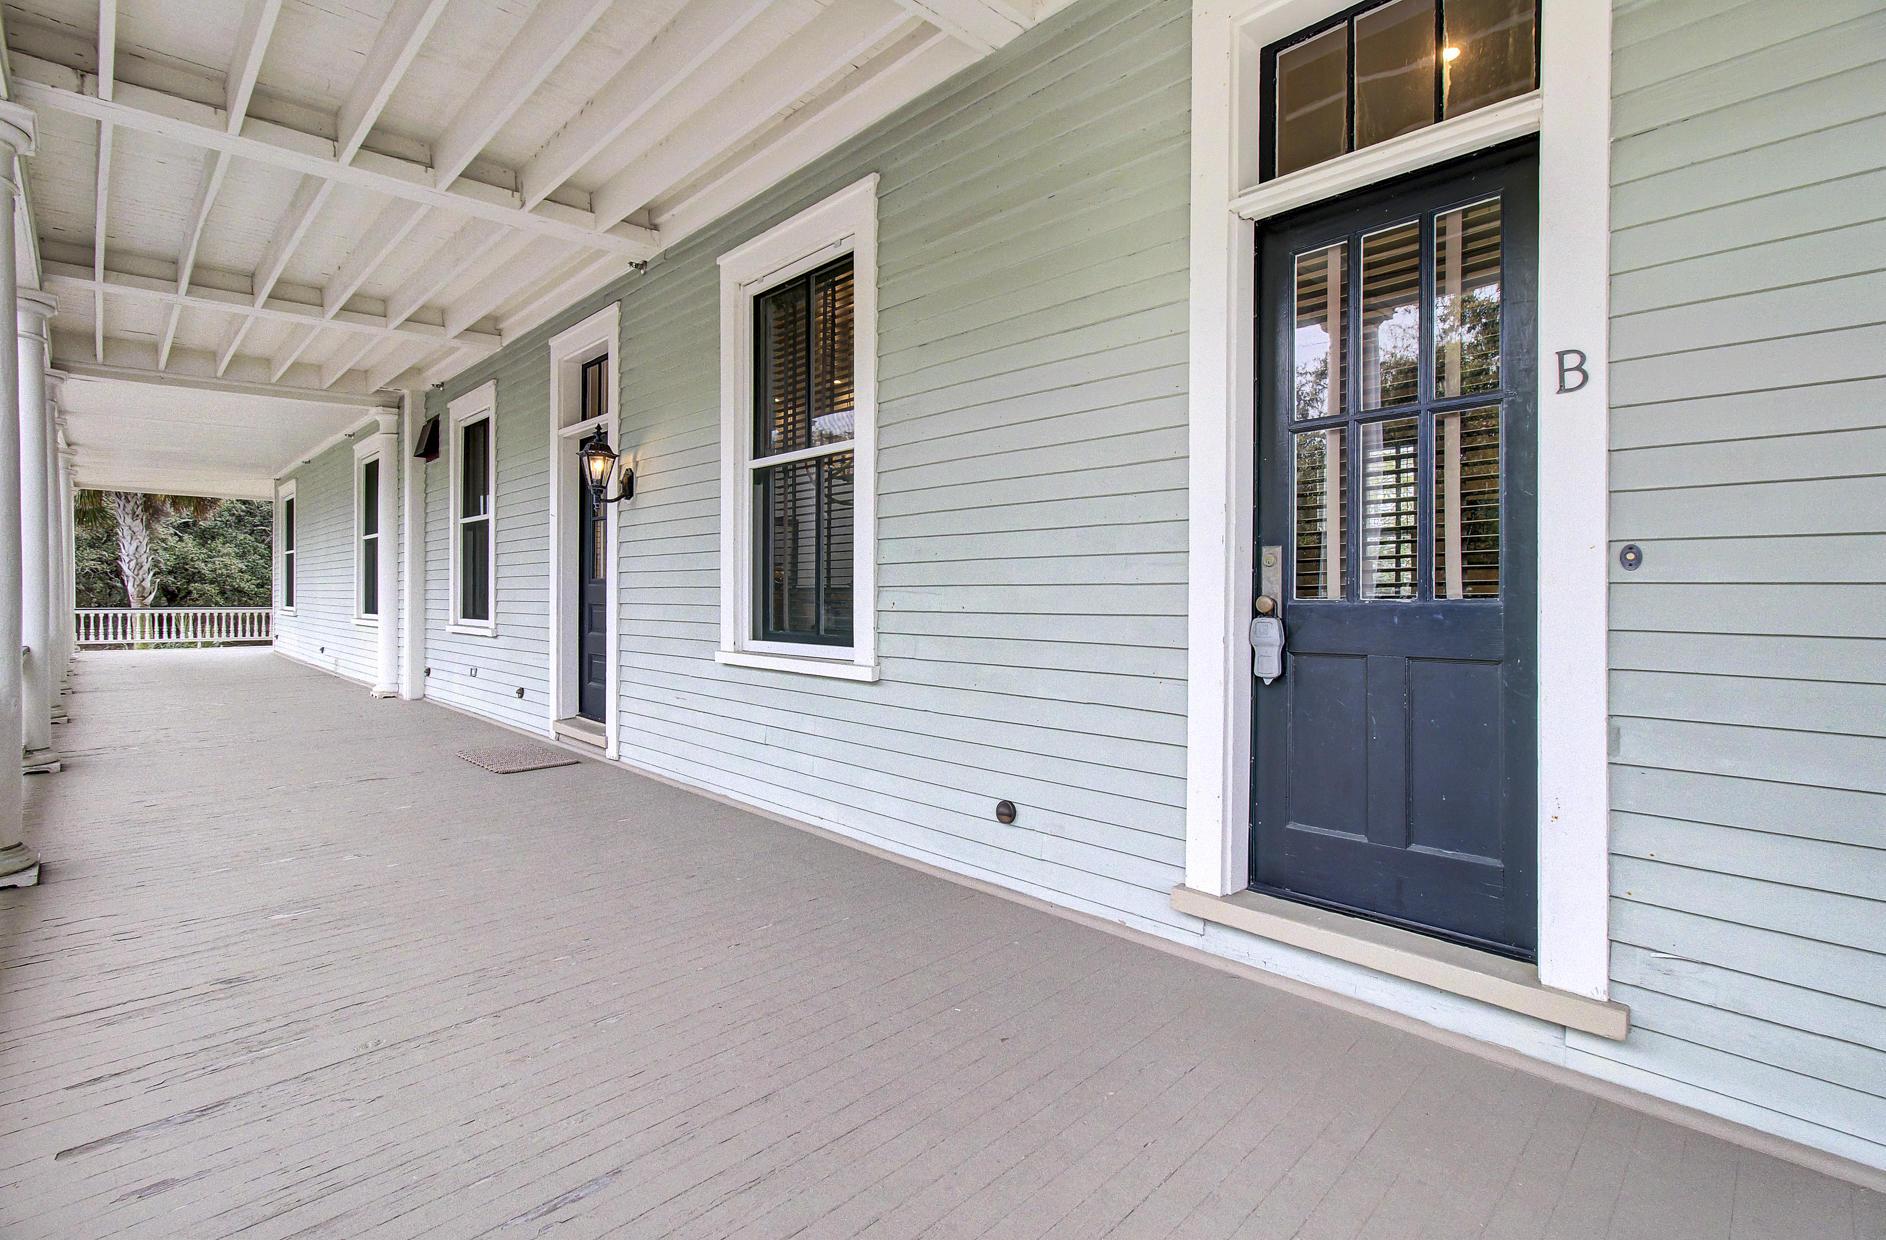 Sullivans Island Homes For Sale - 1766 Ion, Sullivans Island, SC - 14